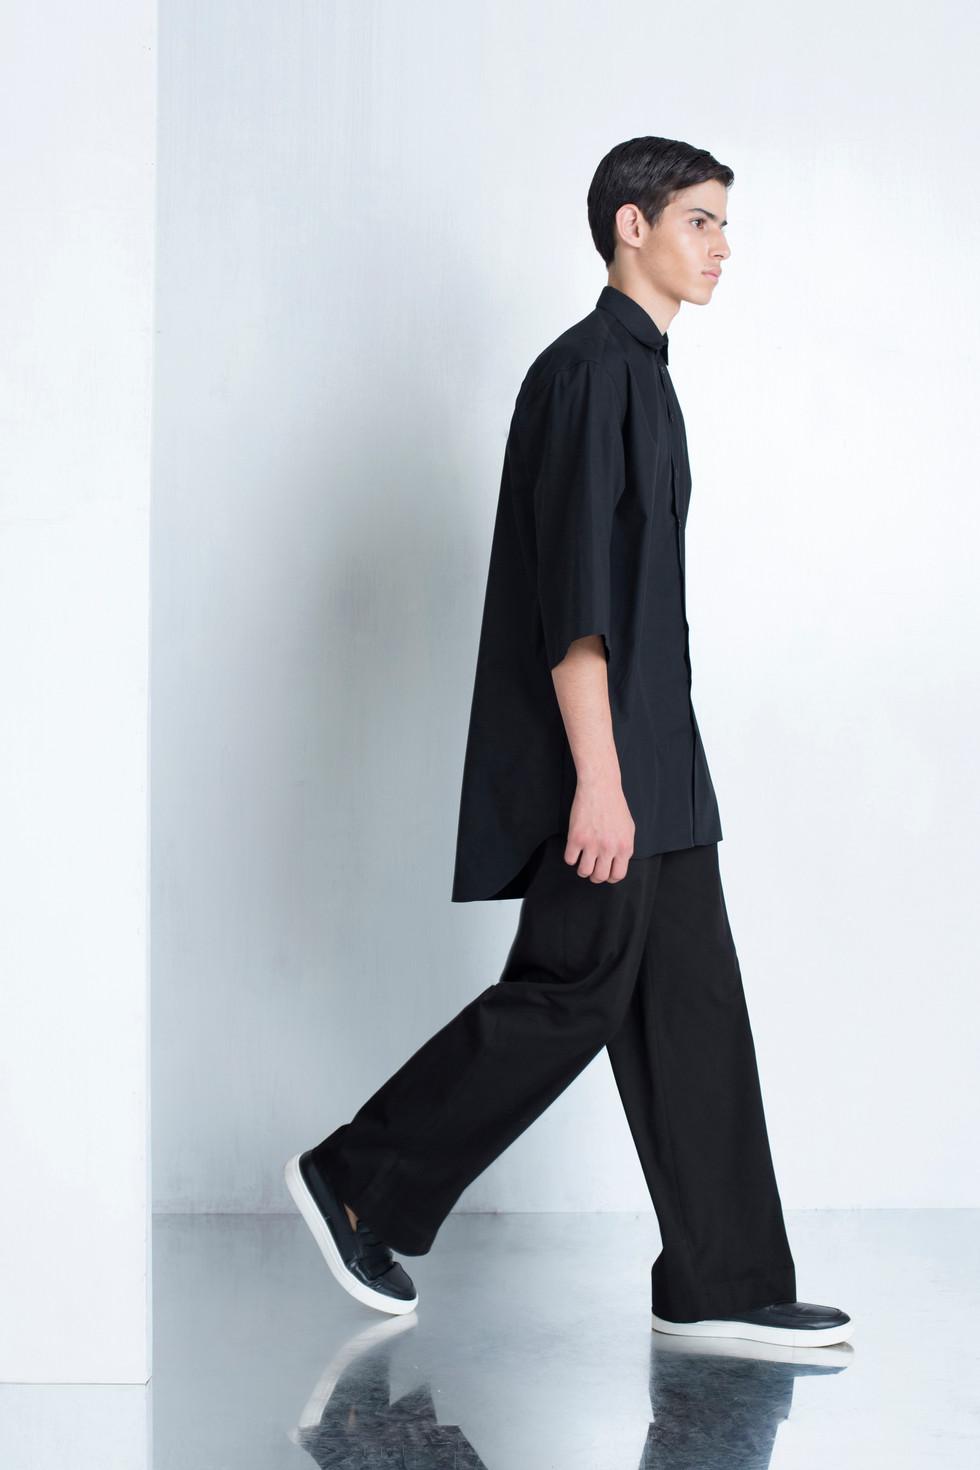 Ariel_Bassan_Minimal_Menswear_AW_LookBook_Tailored_Wide_Trousers